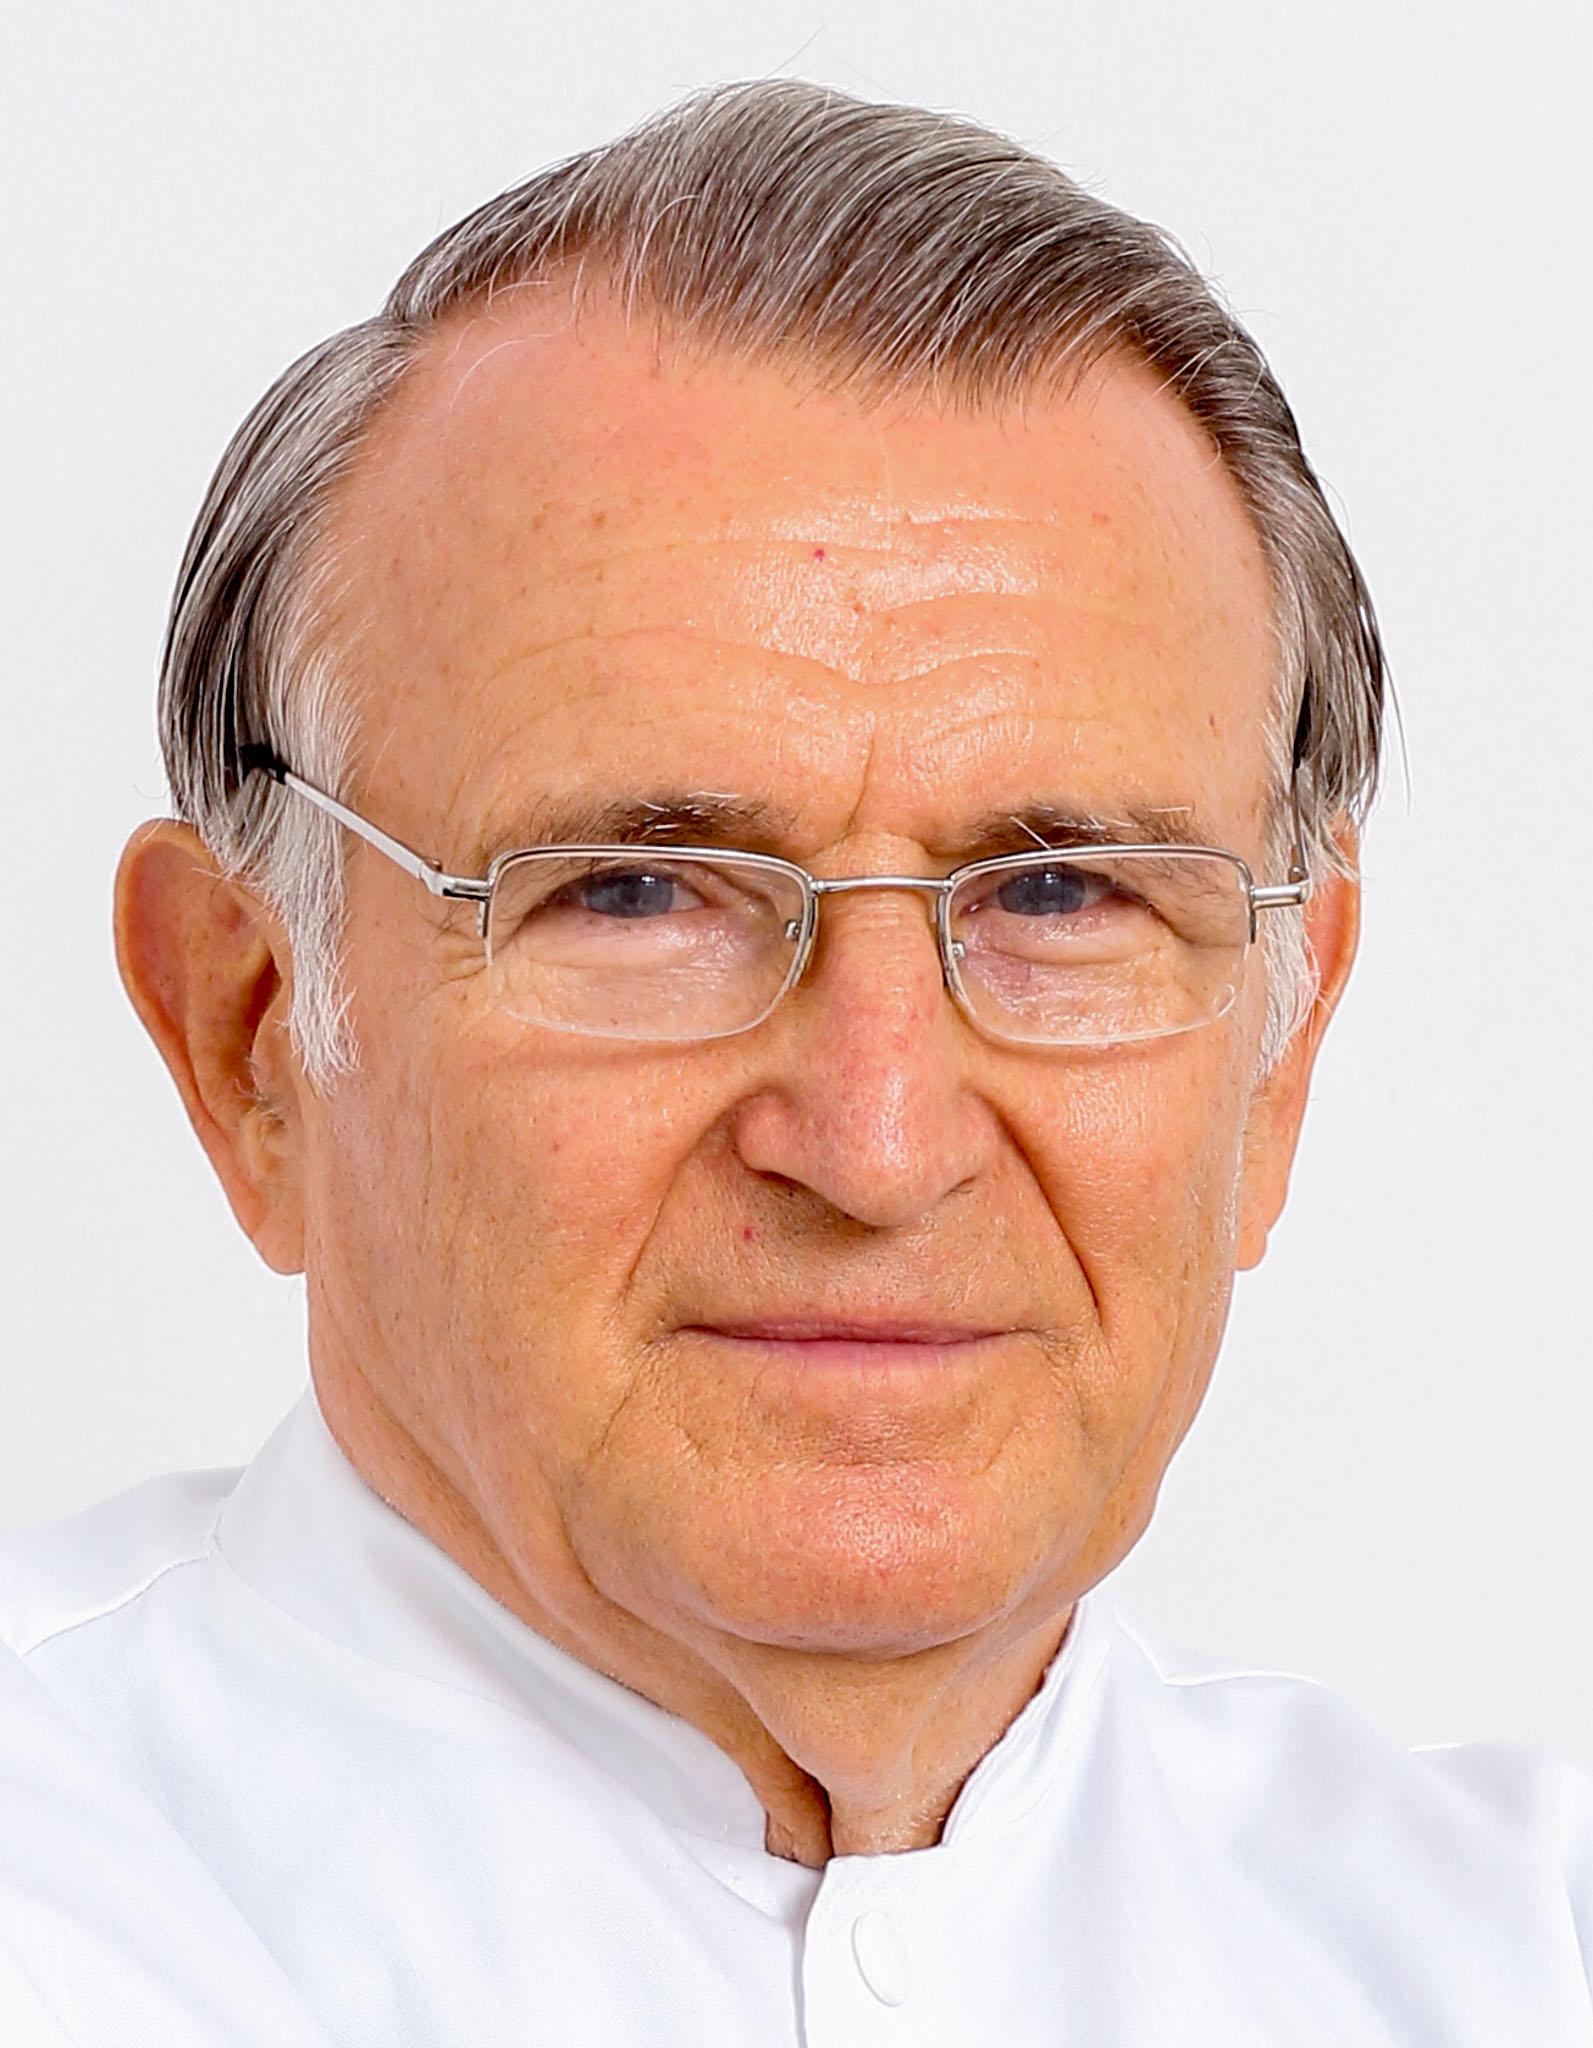 Dr. Virgiliu Stroescu